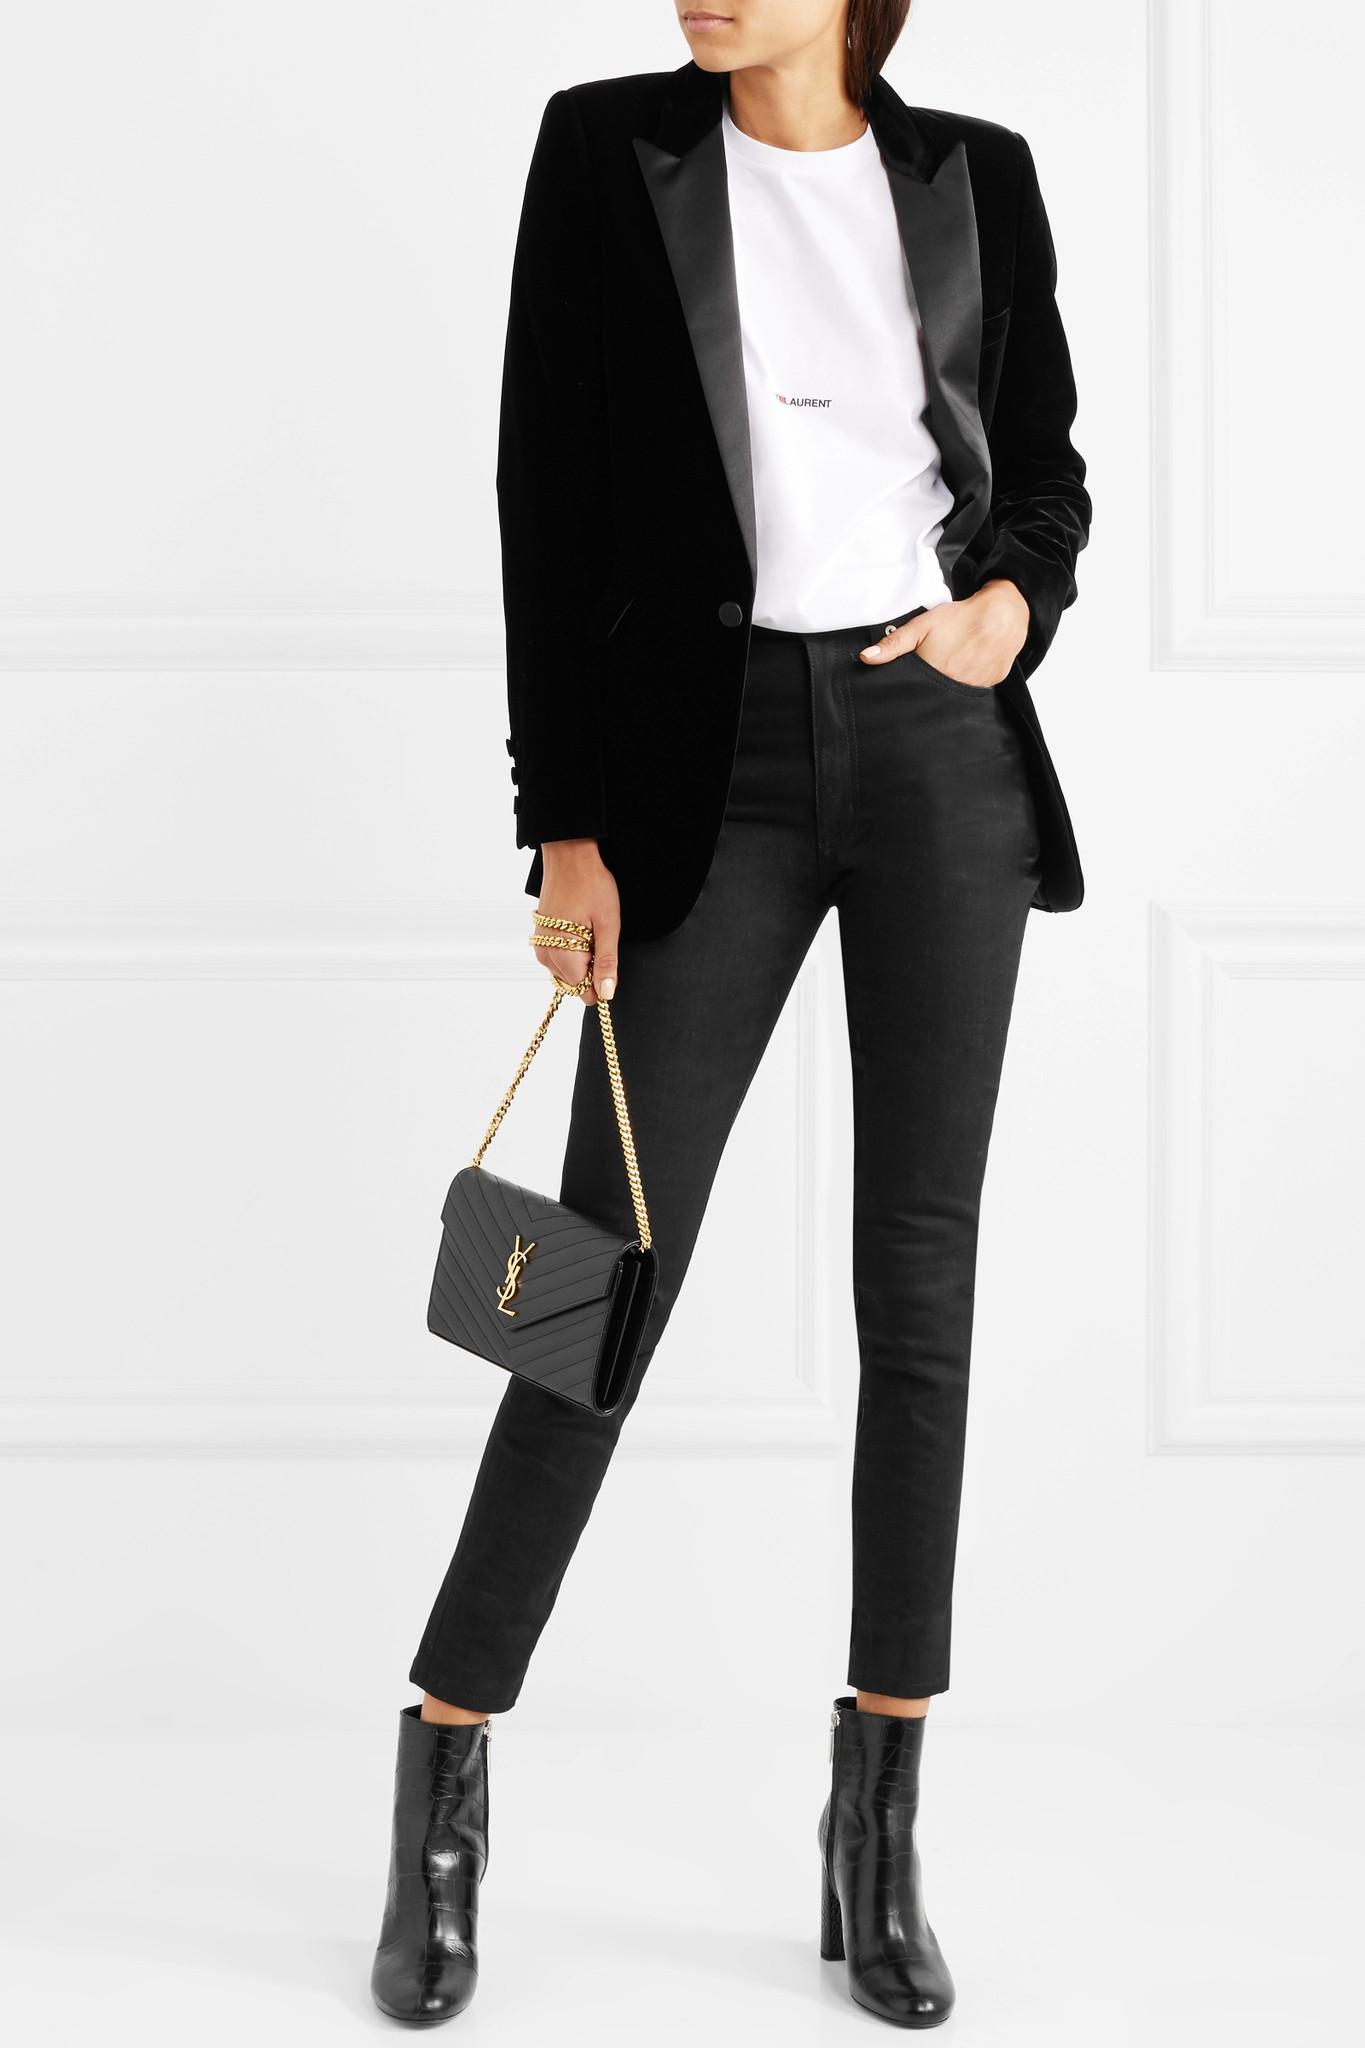 e115a7828d4 Saint Laurent Loulou Croc-effect Leather Ankle Boots in Black - Lyst